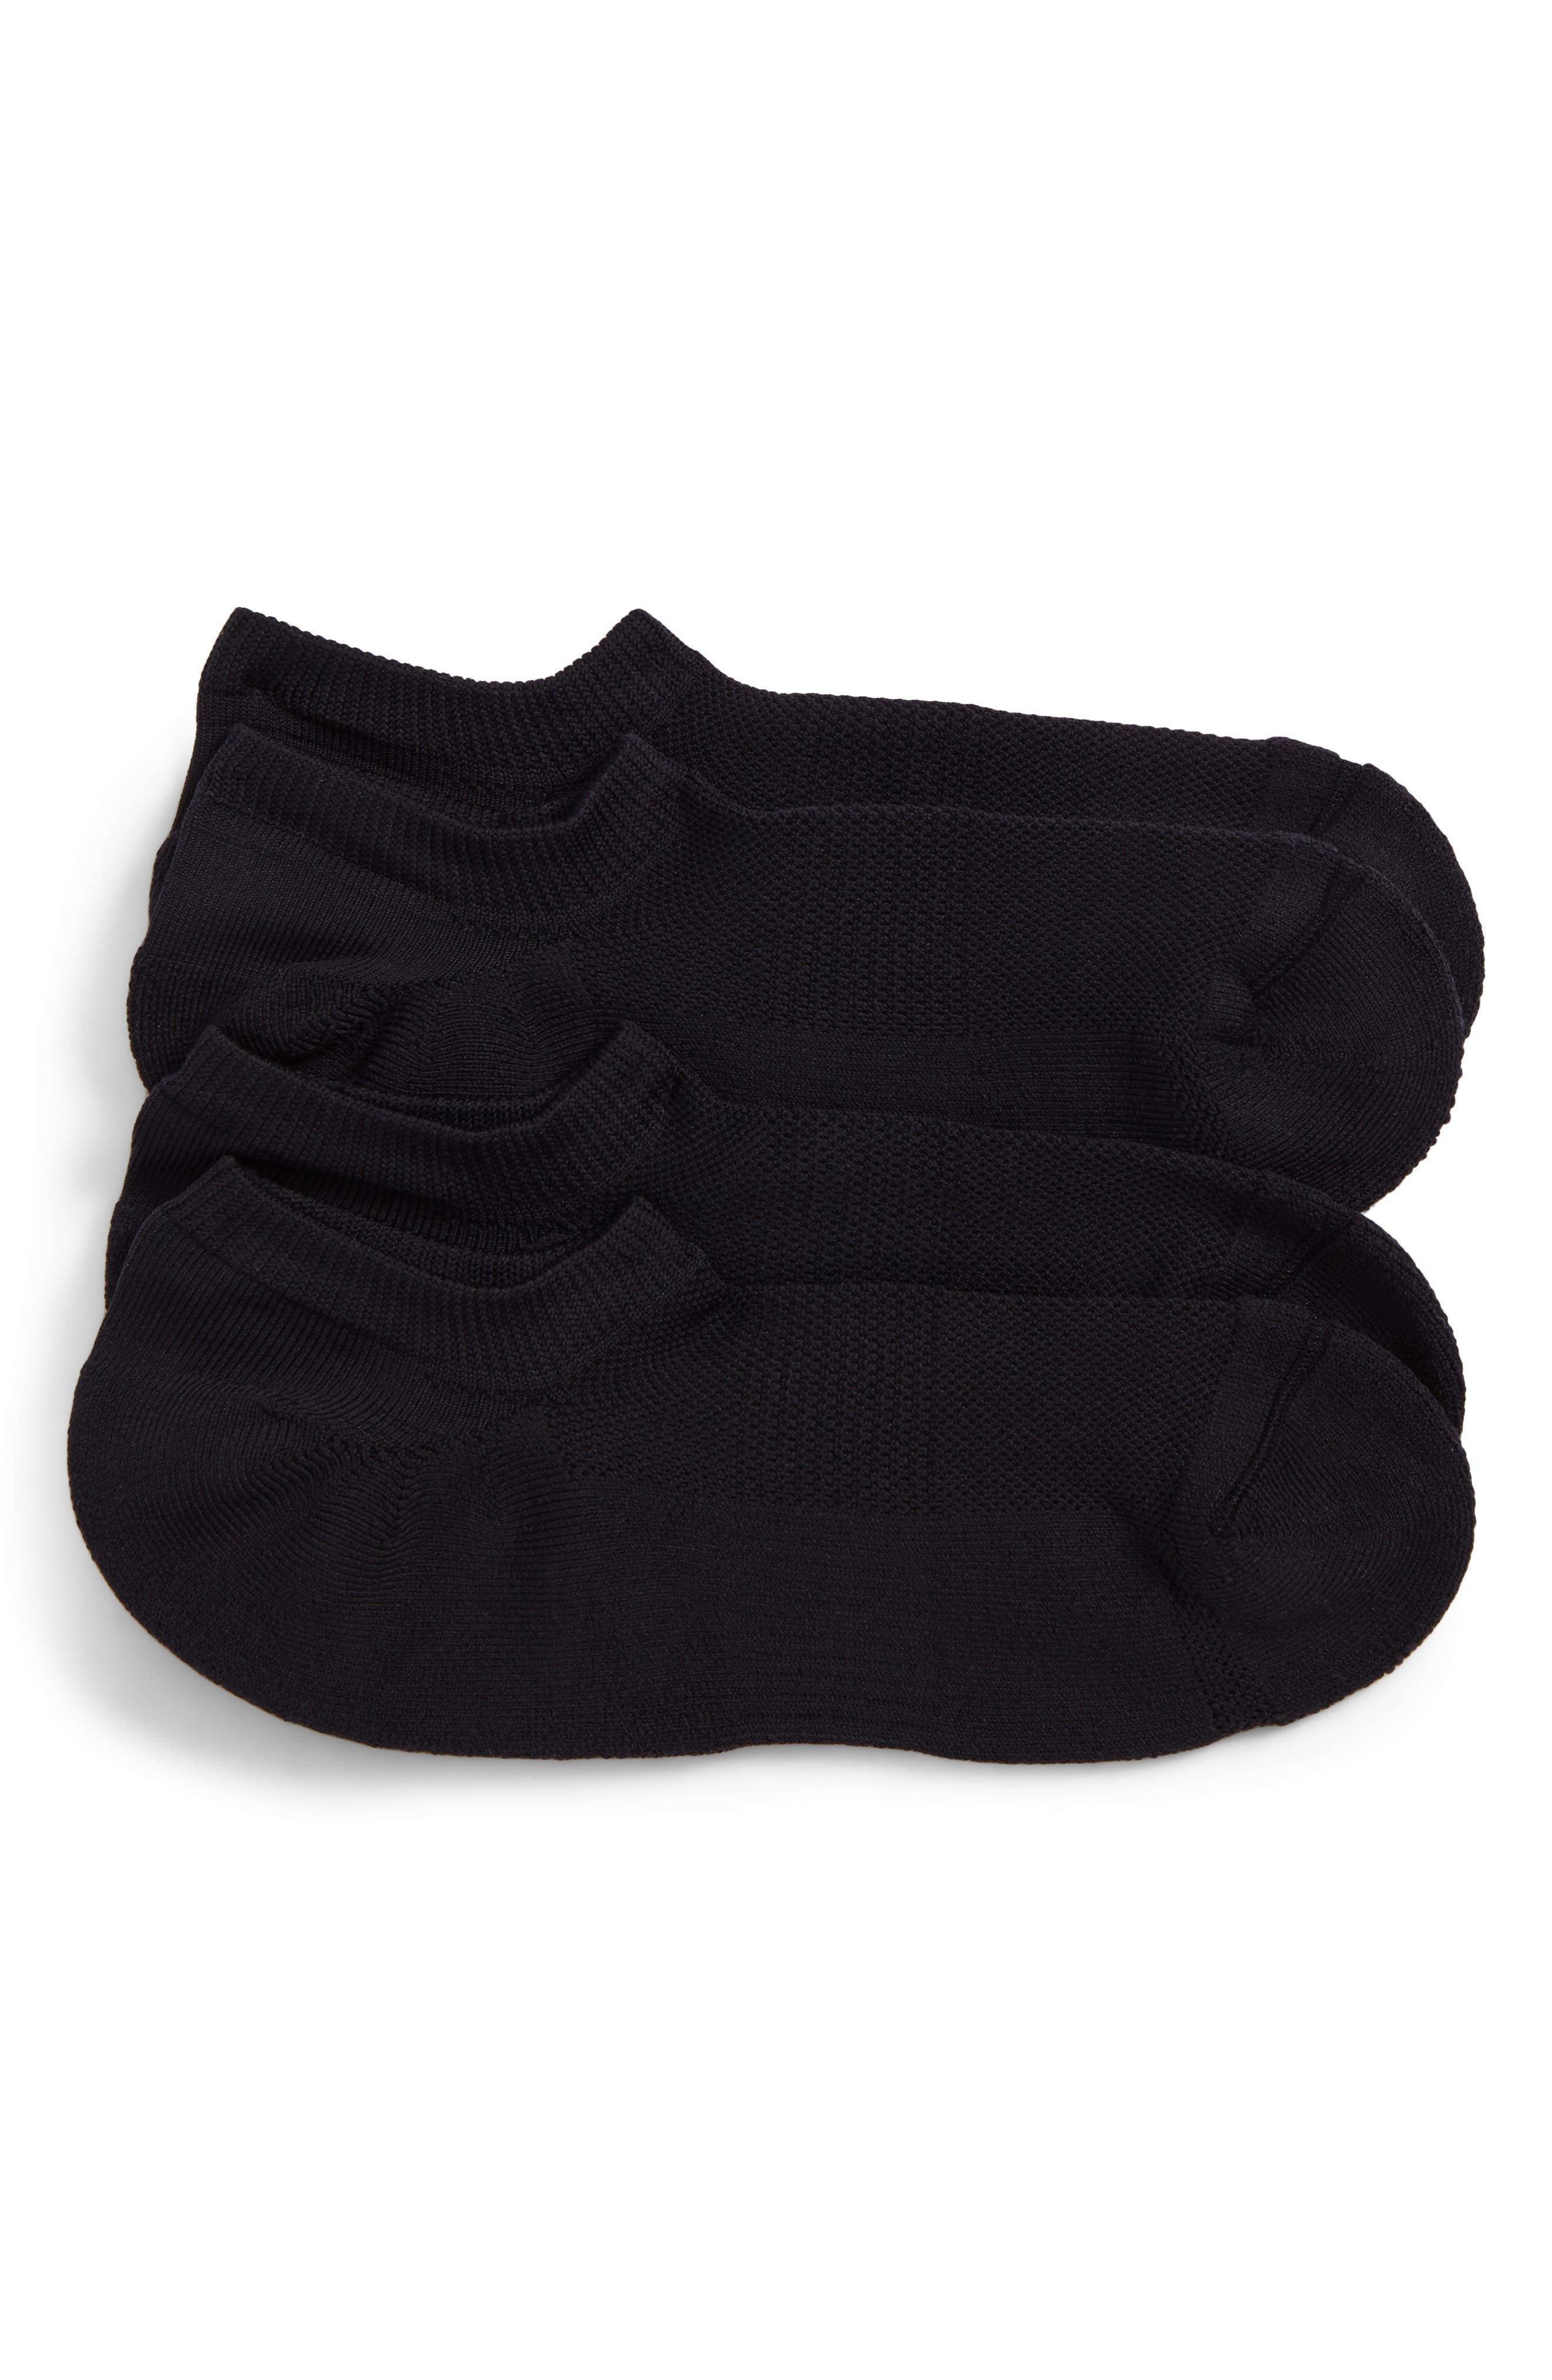 Tech-Smart 2-Pack No-Show Socks,                             Main thumbnail 1, color,                             001